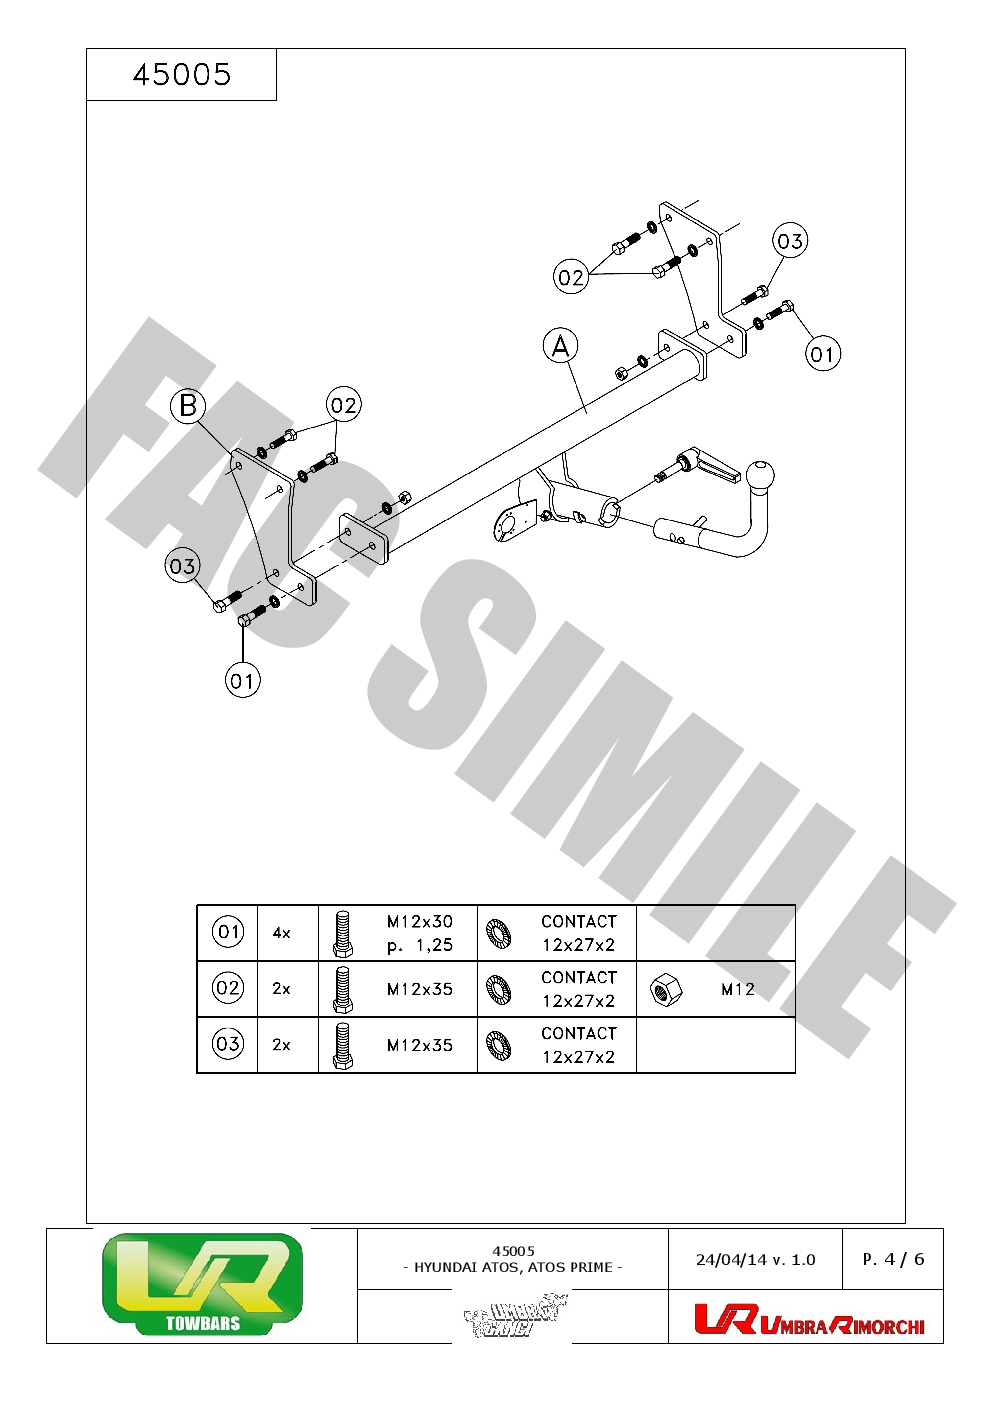 hight resolution of detachable towbar 13pin c2 wiring kit for hyundai